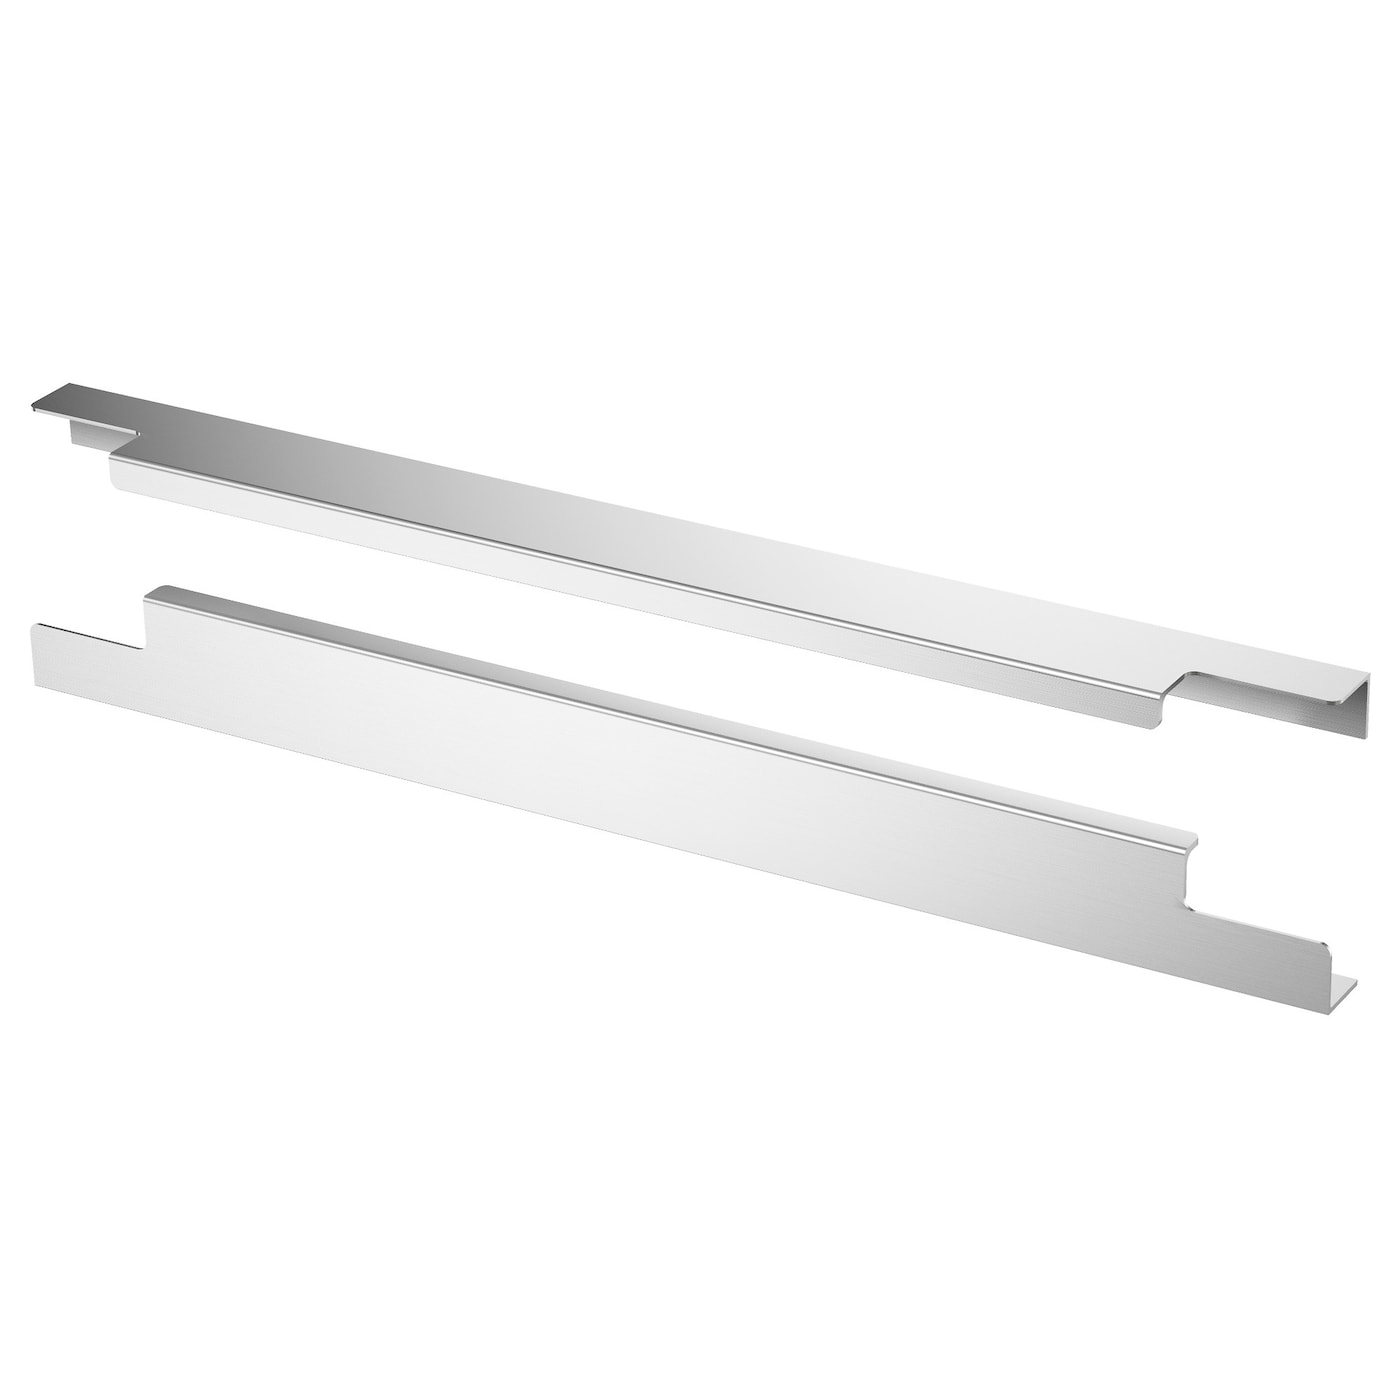 Blankett Handle Aluminium 395 Mm Ikea